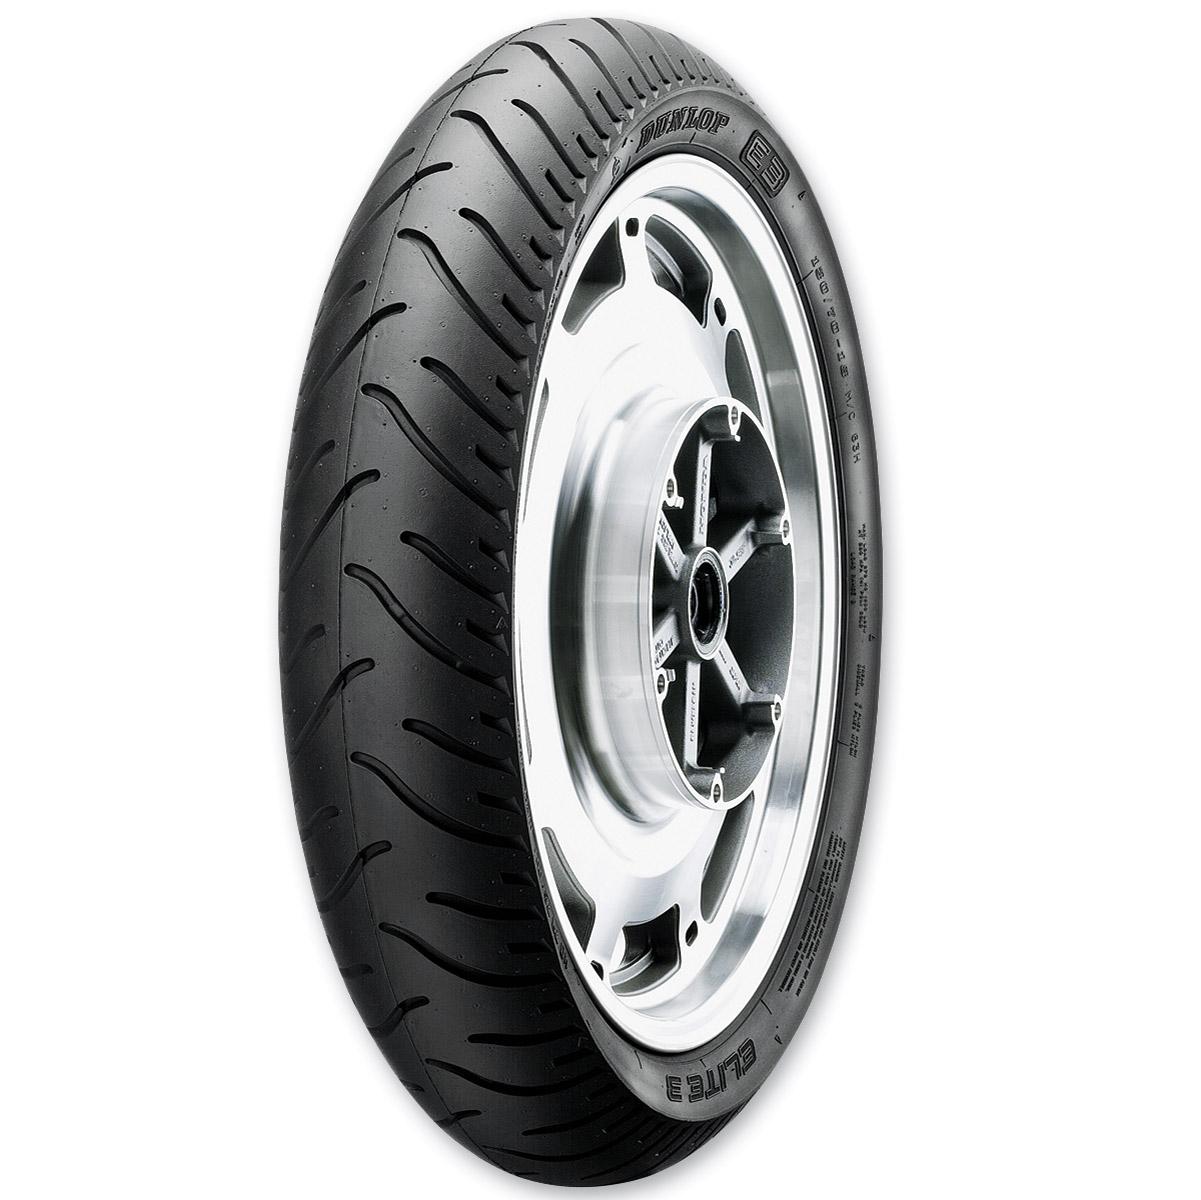 Dunlop Elite 3 MR90-18 Front Tire